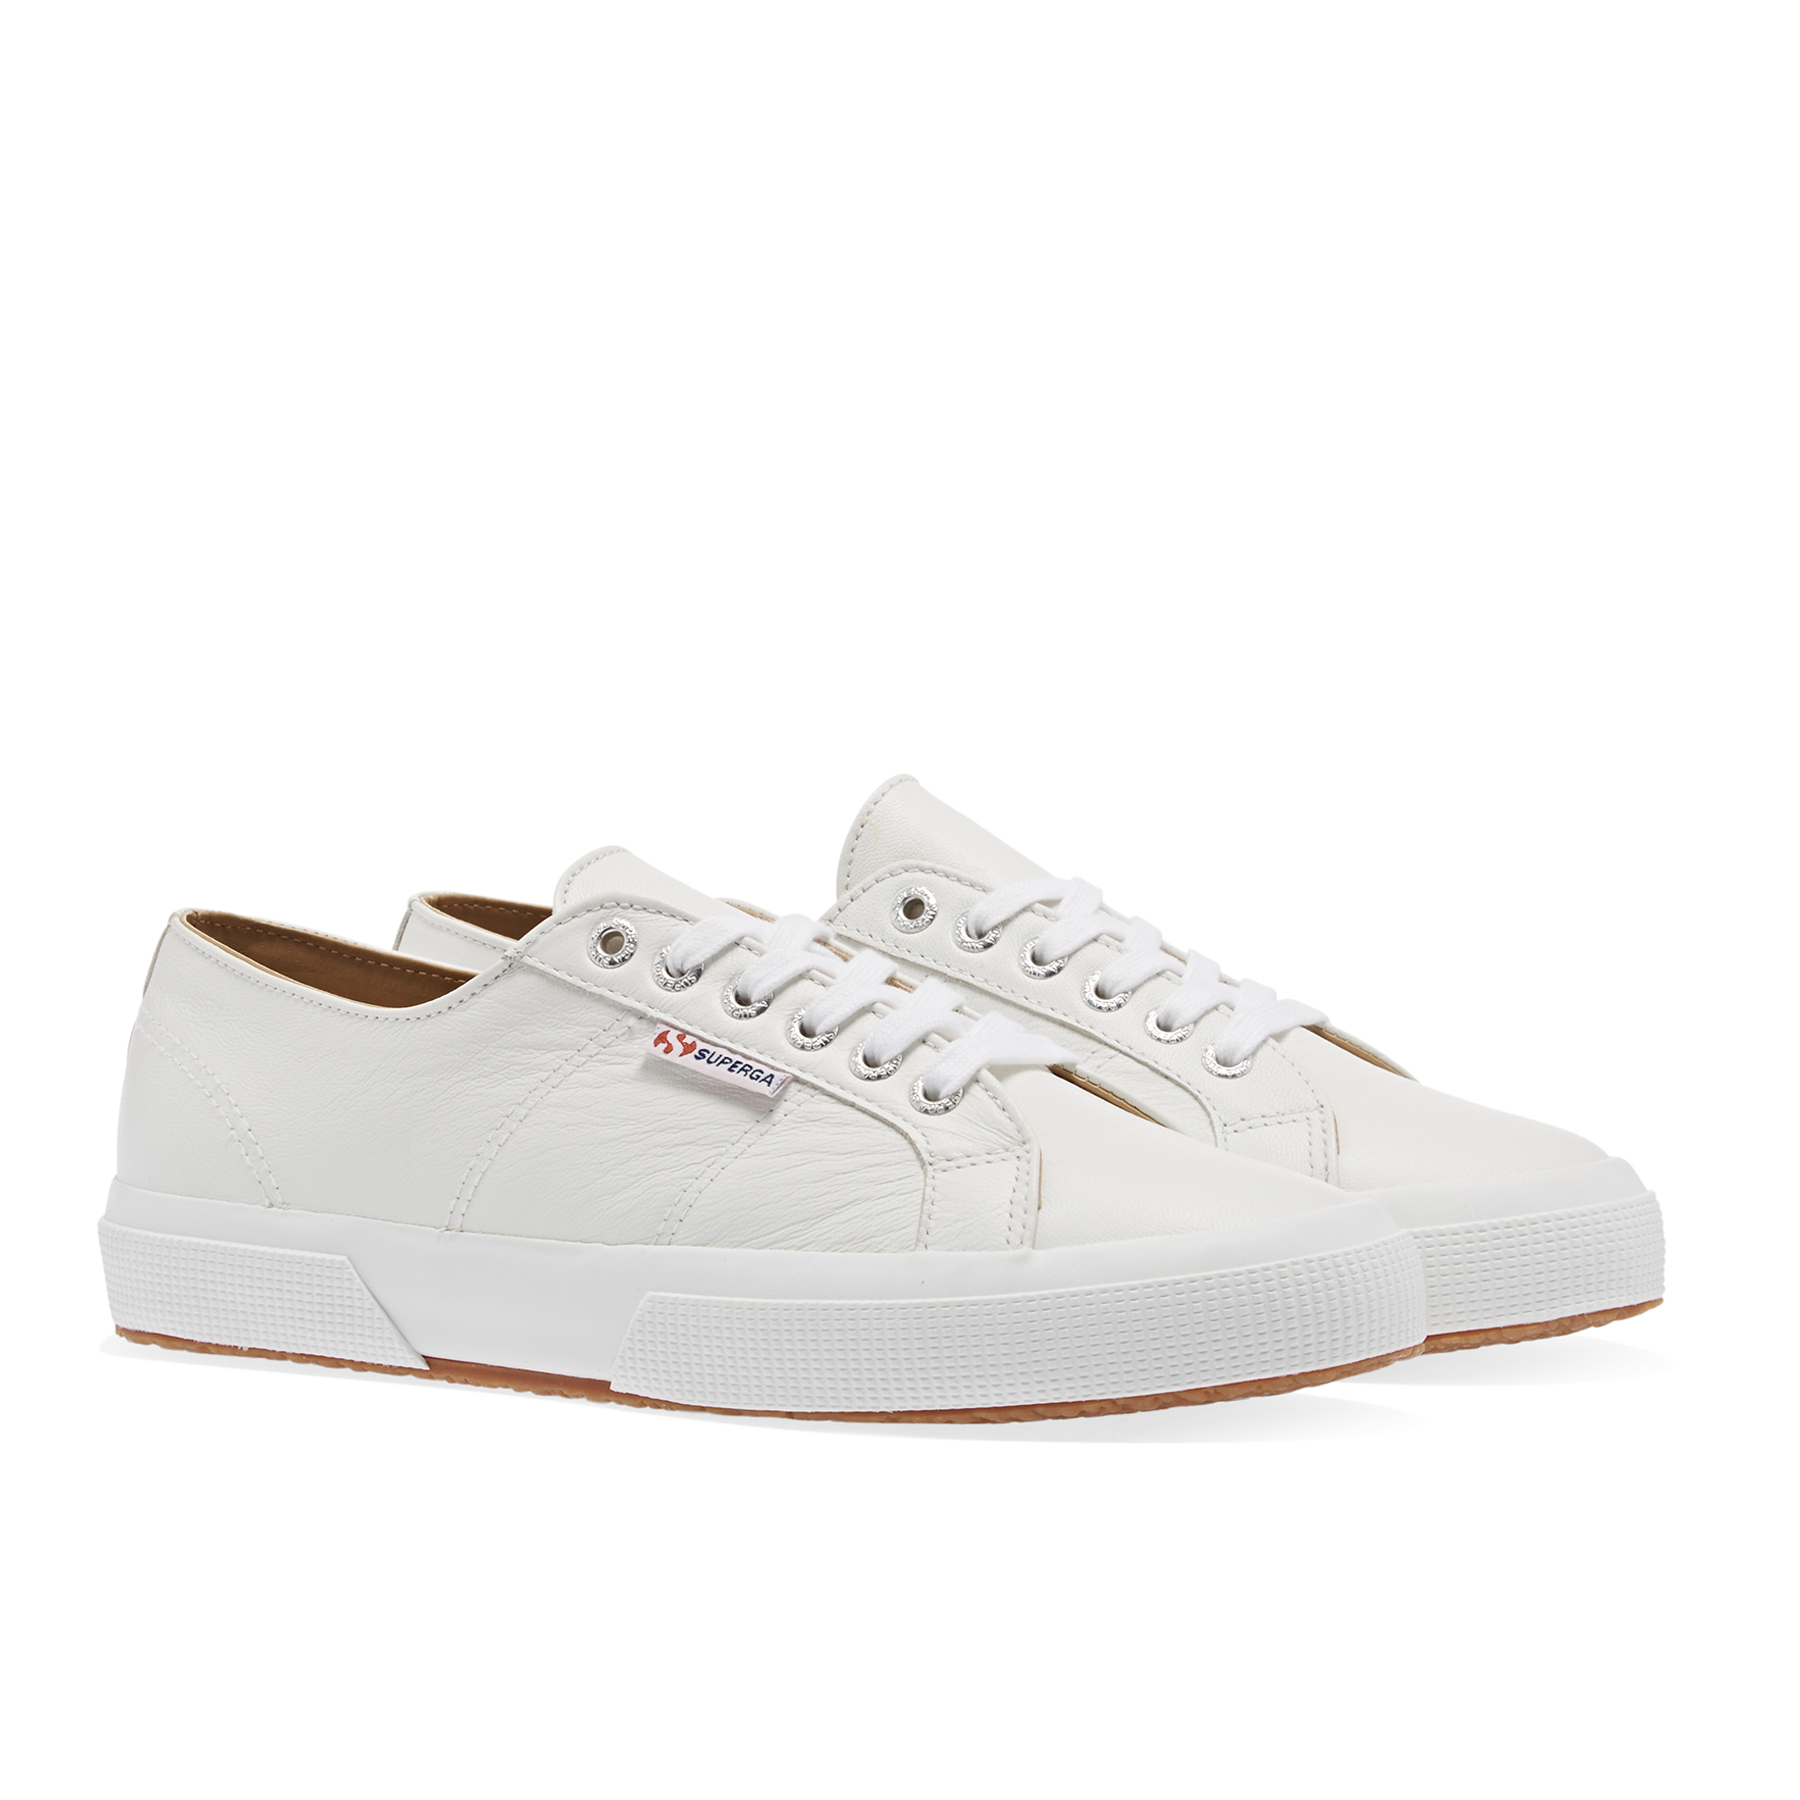 Superga 2750 Nappaleau Shoes - Free